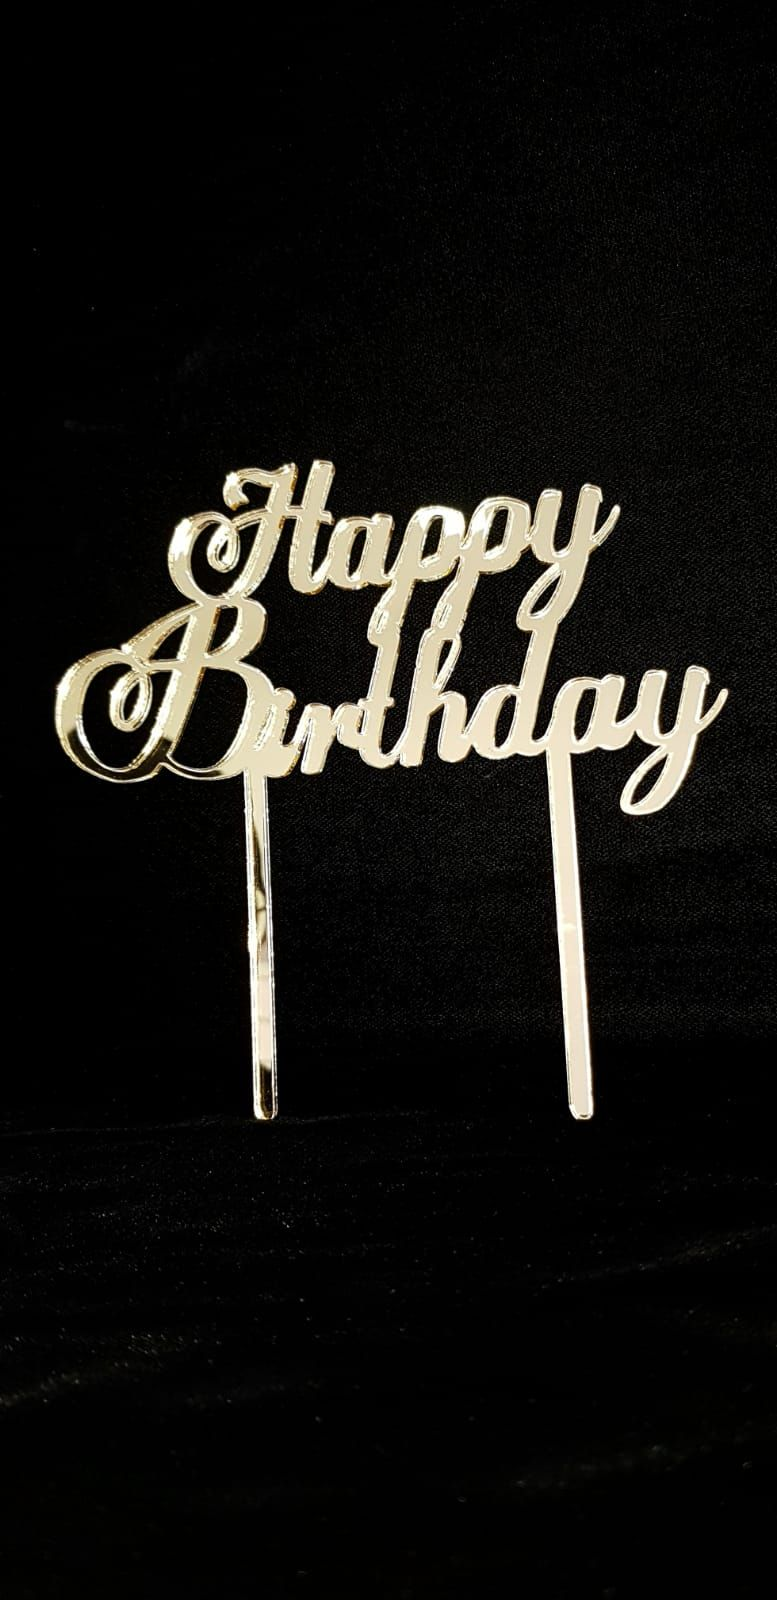 اكليريك هبي بيرثدي Acrylic Happy Birthday Acrylic Cake Topper Cake Toppers Happy